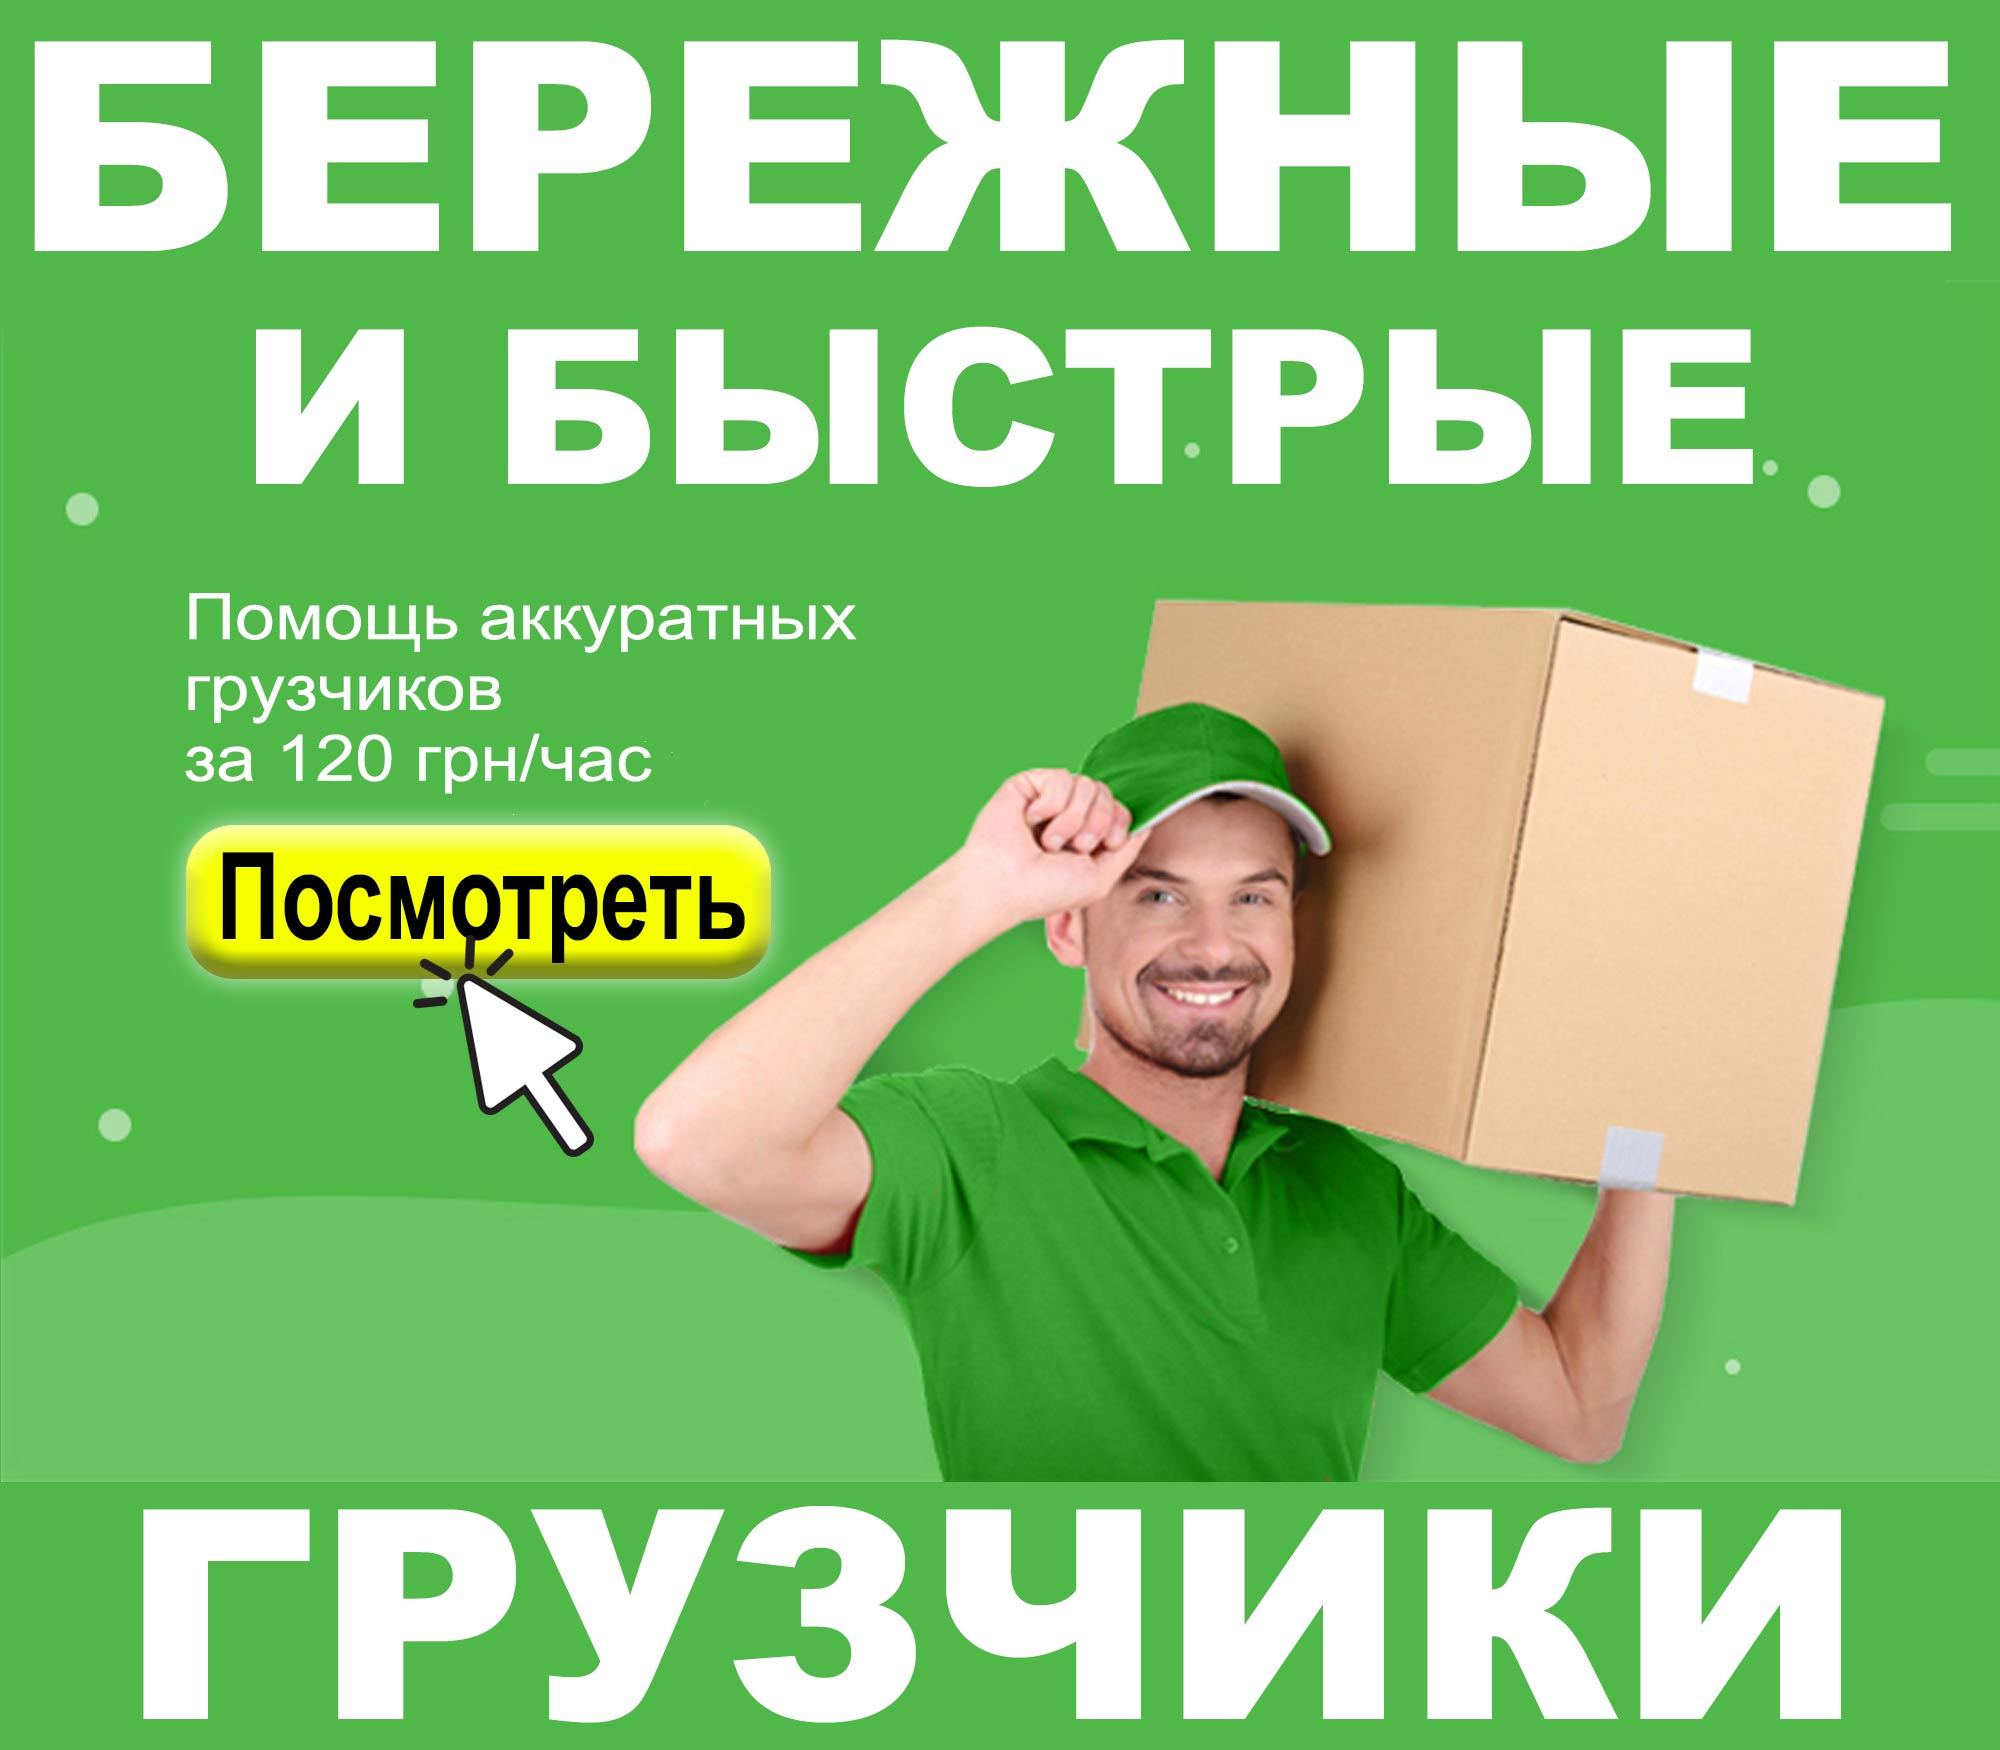 Фото Грузоперевозки/Грузовое такси по Днепру, области и Украине 7,3 грн/км 3